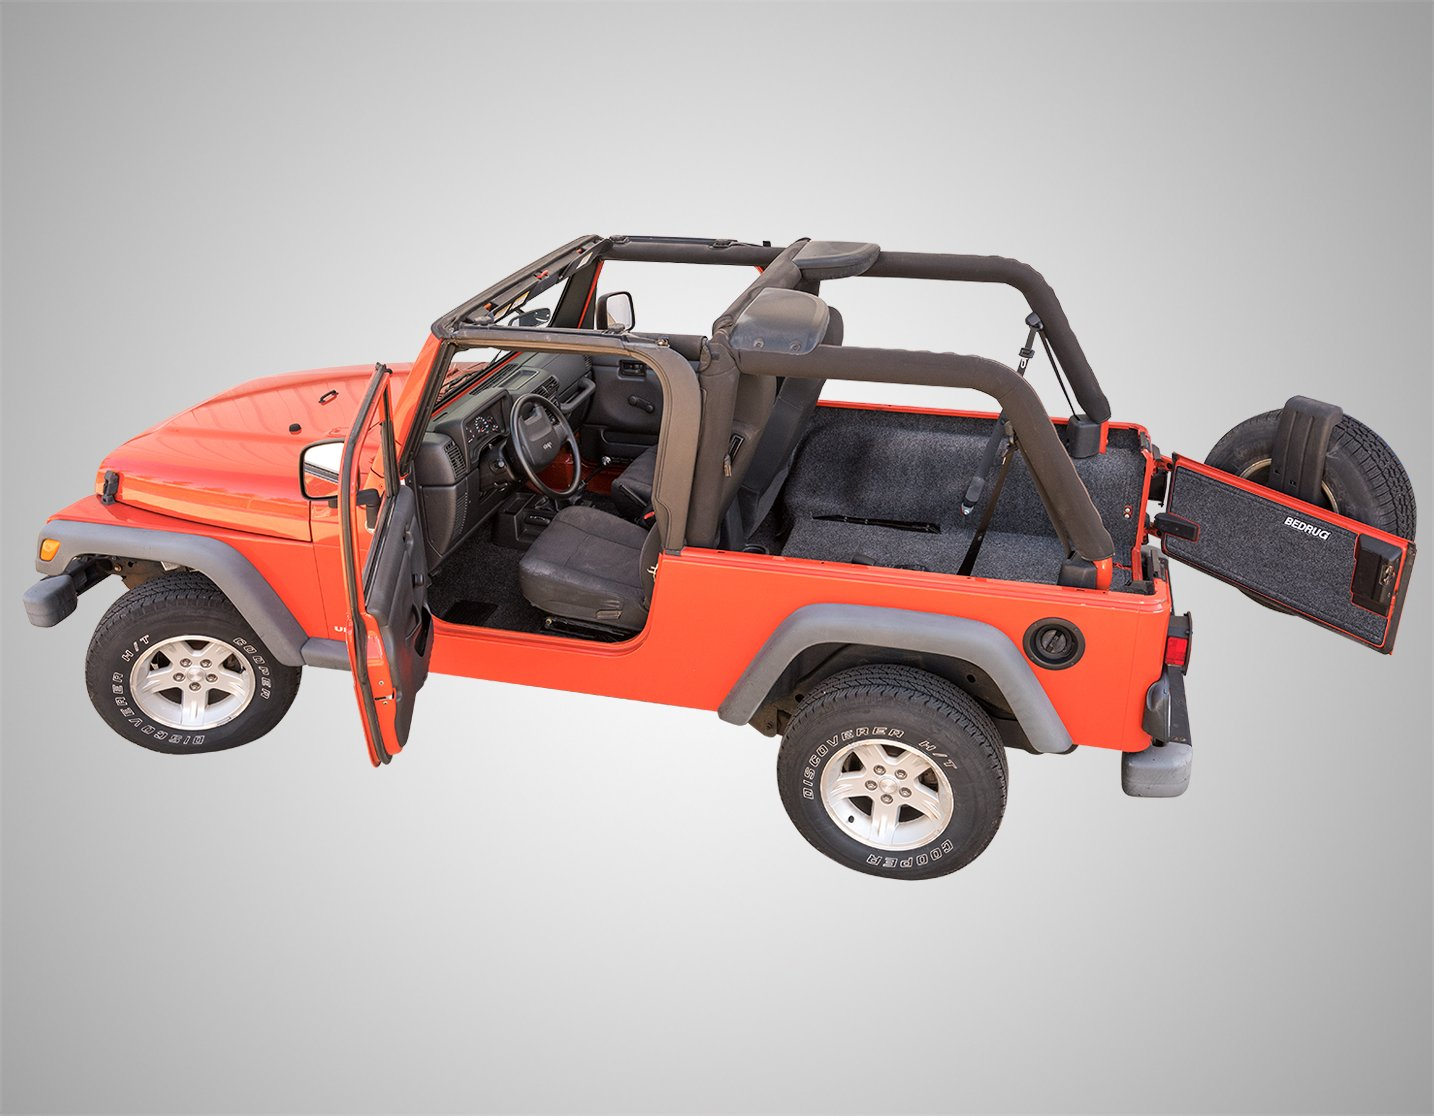 Includes Front and Cargo Kit w// console BedRug Jeep Combo Kit BedRug CBRLJ04 fits 2004-06 LJ